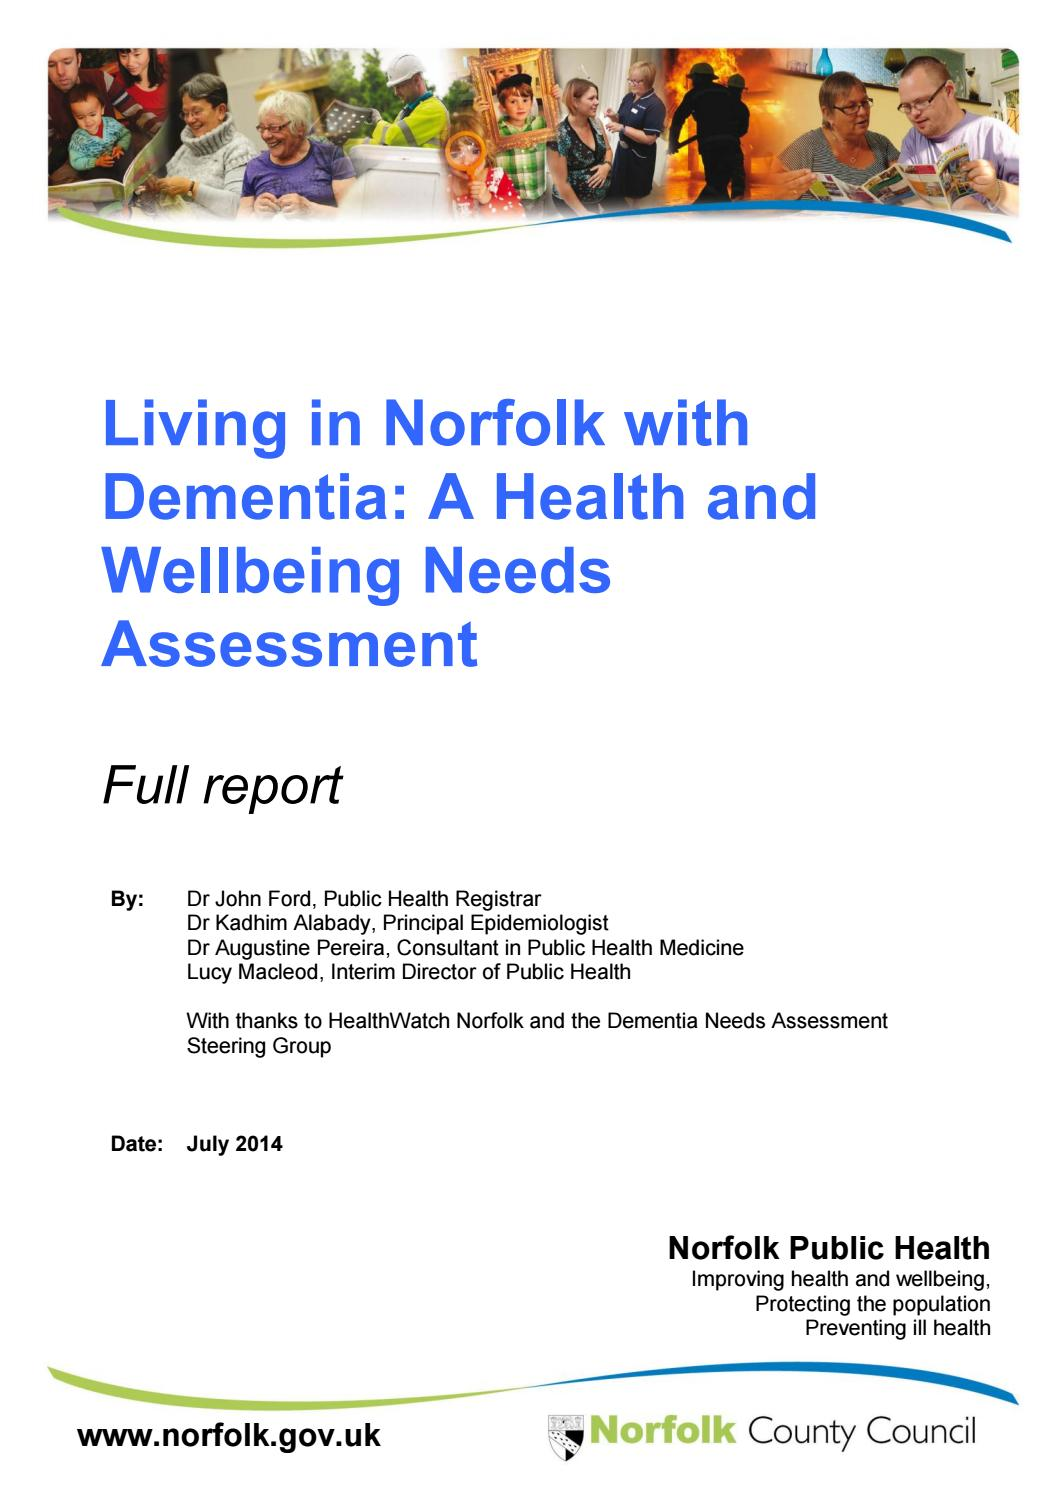 Dementia Needs Assessment For Norfolk By Dr John Ford Dr Kadhim